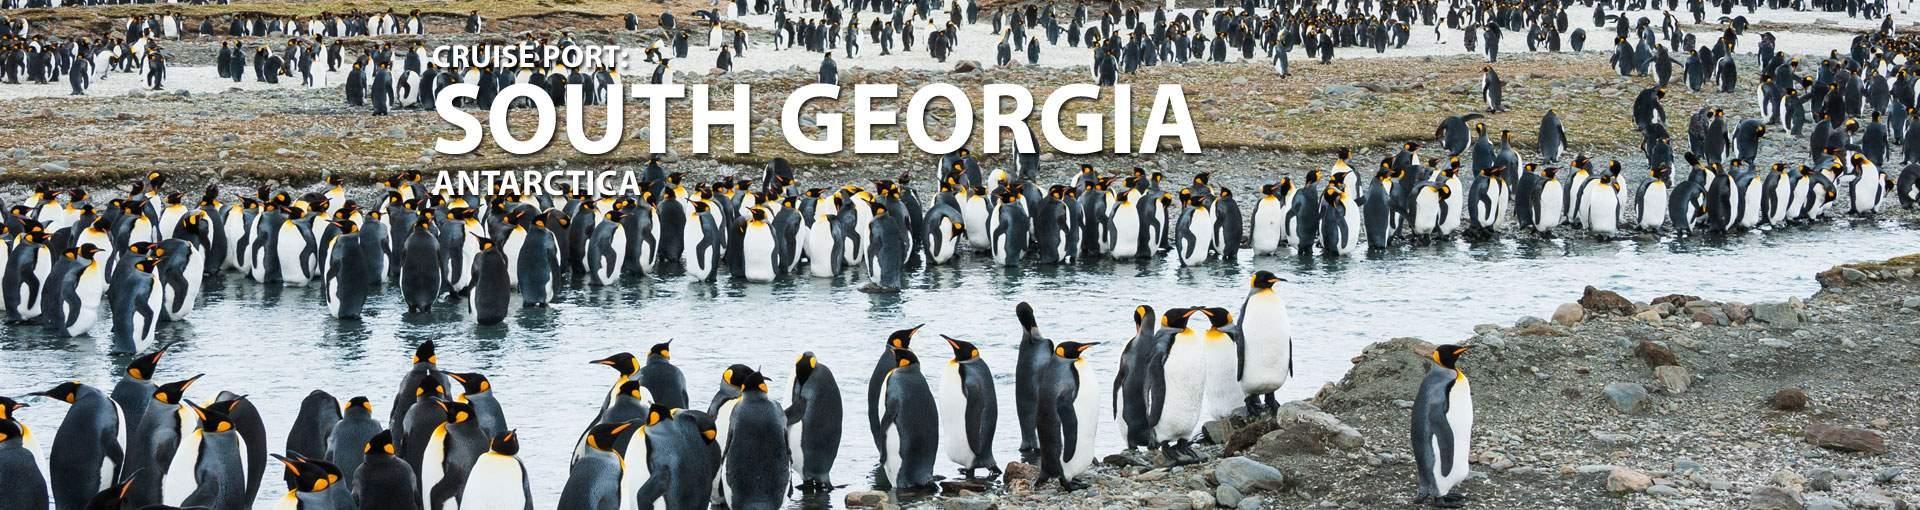 Cruises to South Georgia, Antarctica